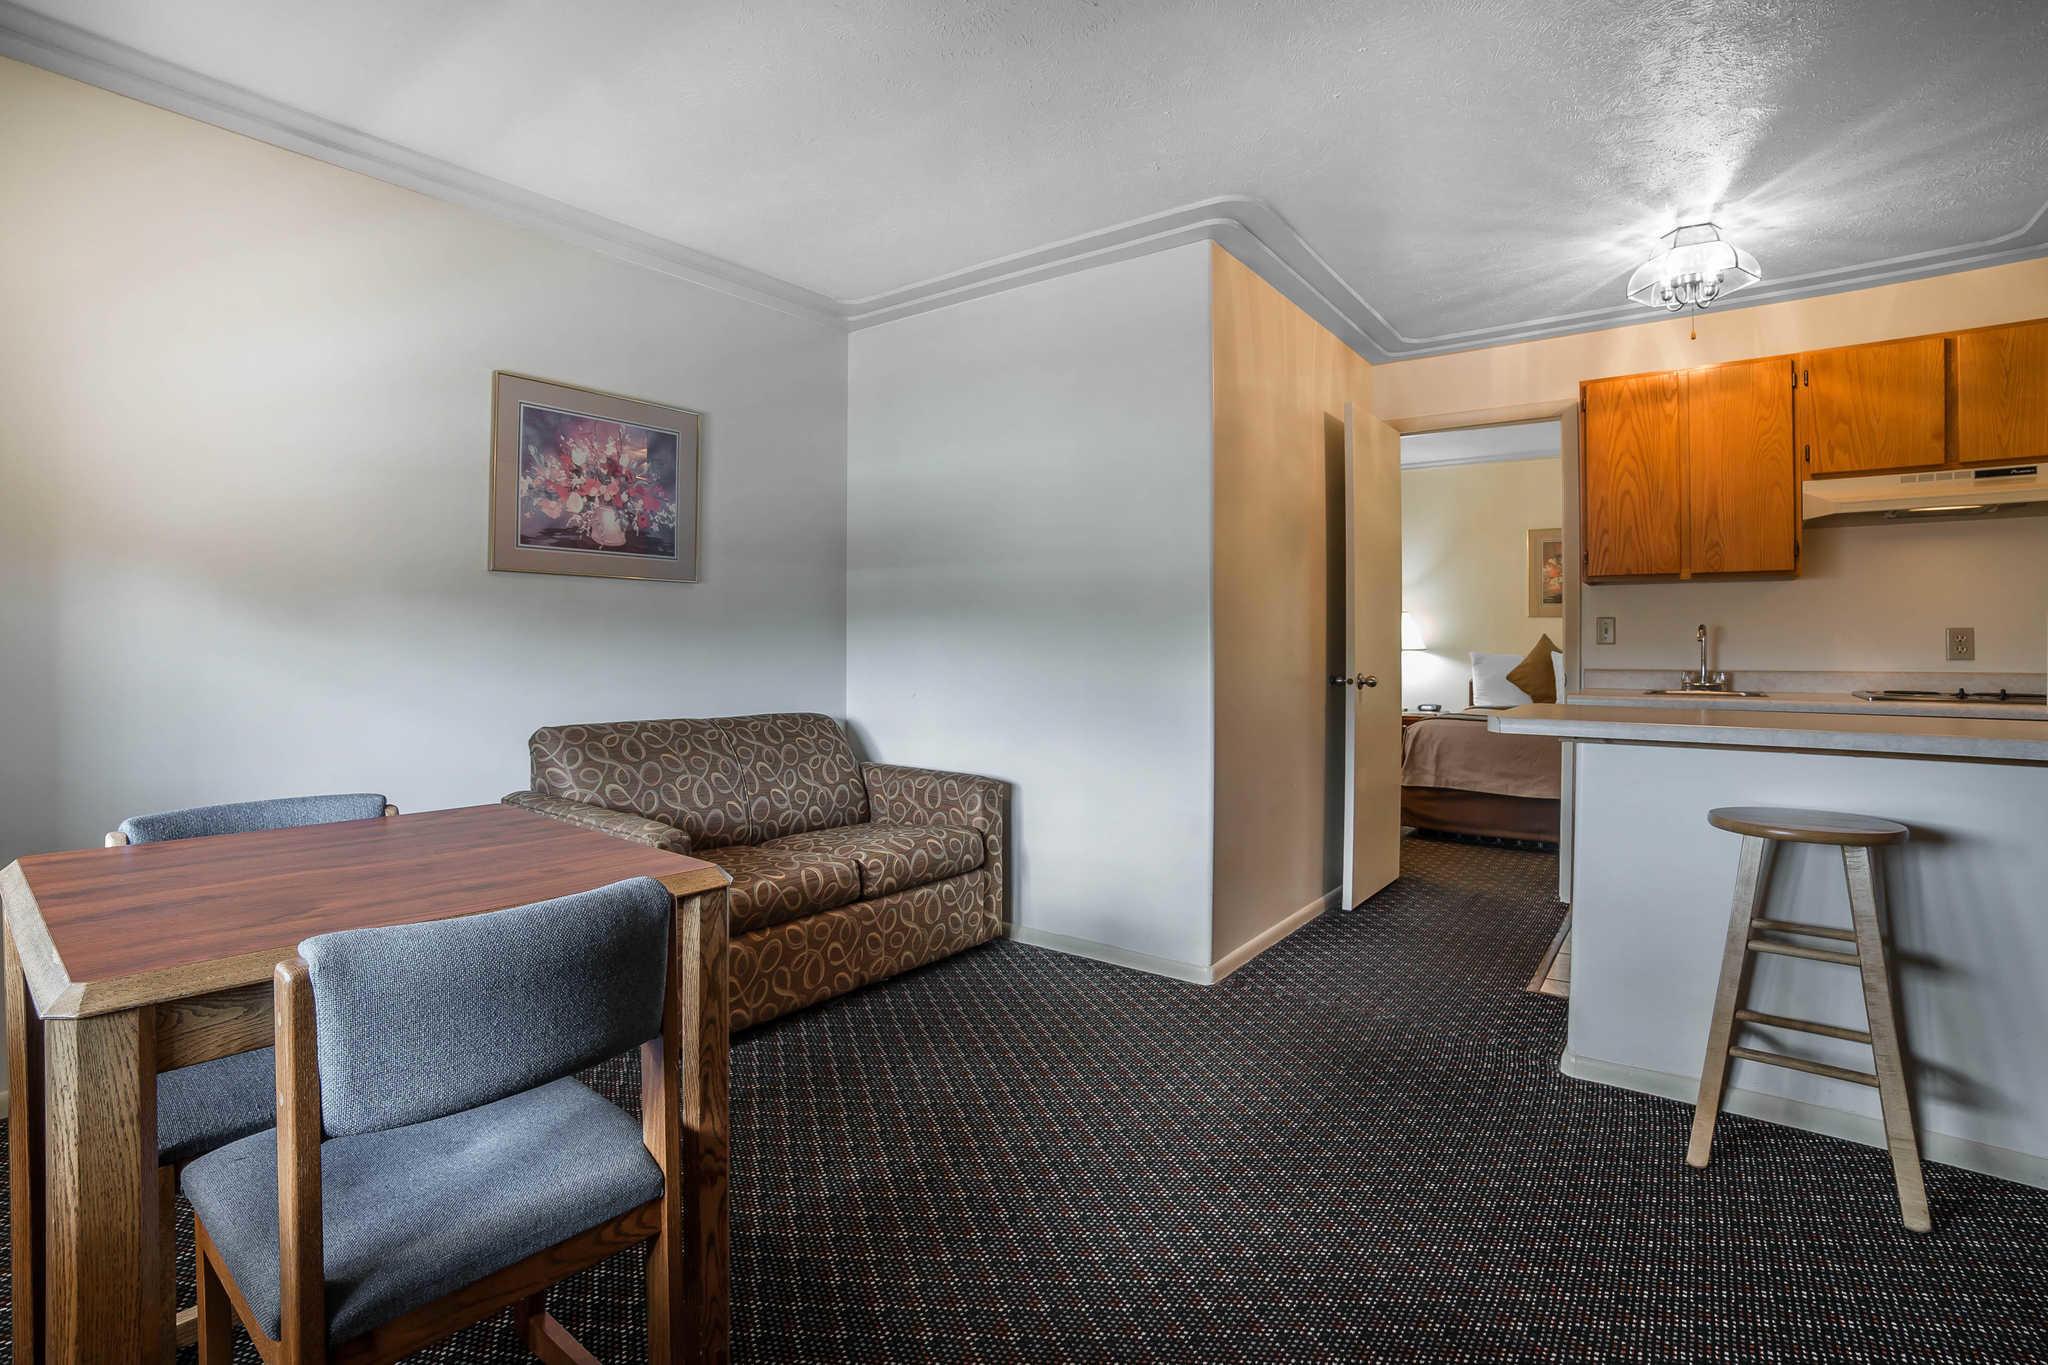 Rodeway Inn Pronghorn Lodge image 9